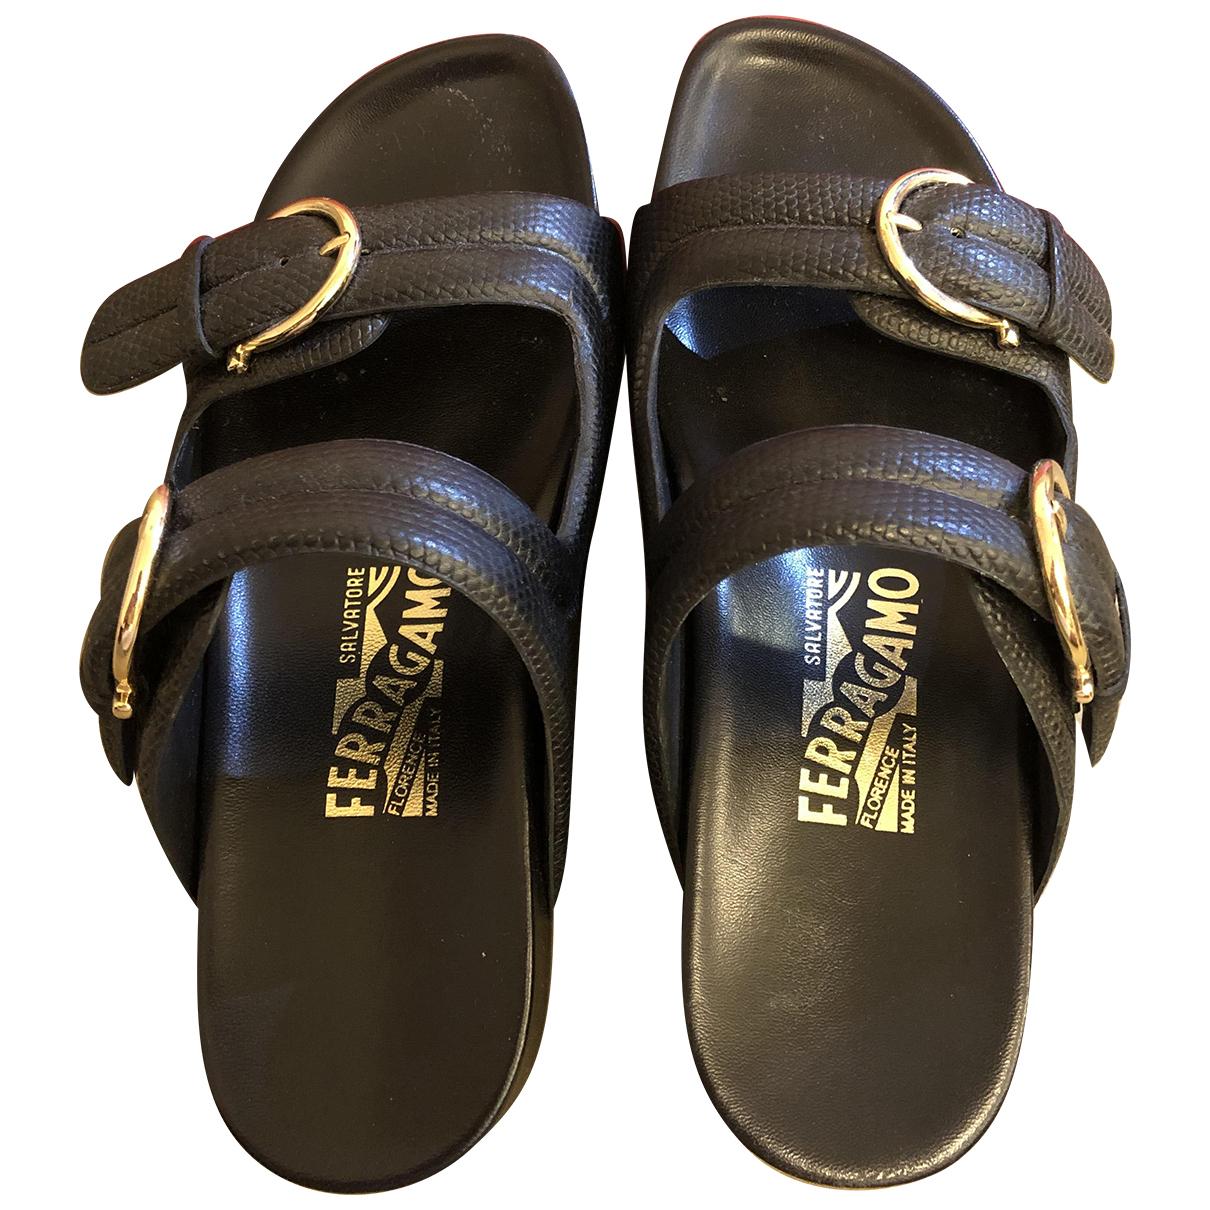 Salvatore Ferragamo \N Black Leather Sandals for Women 6 US